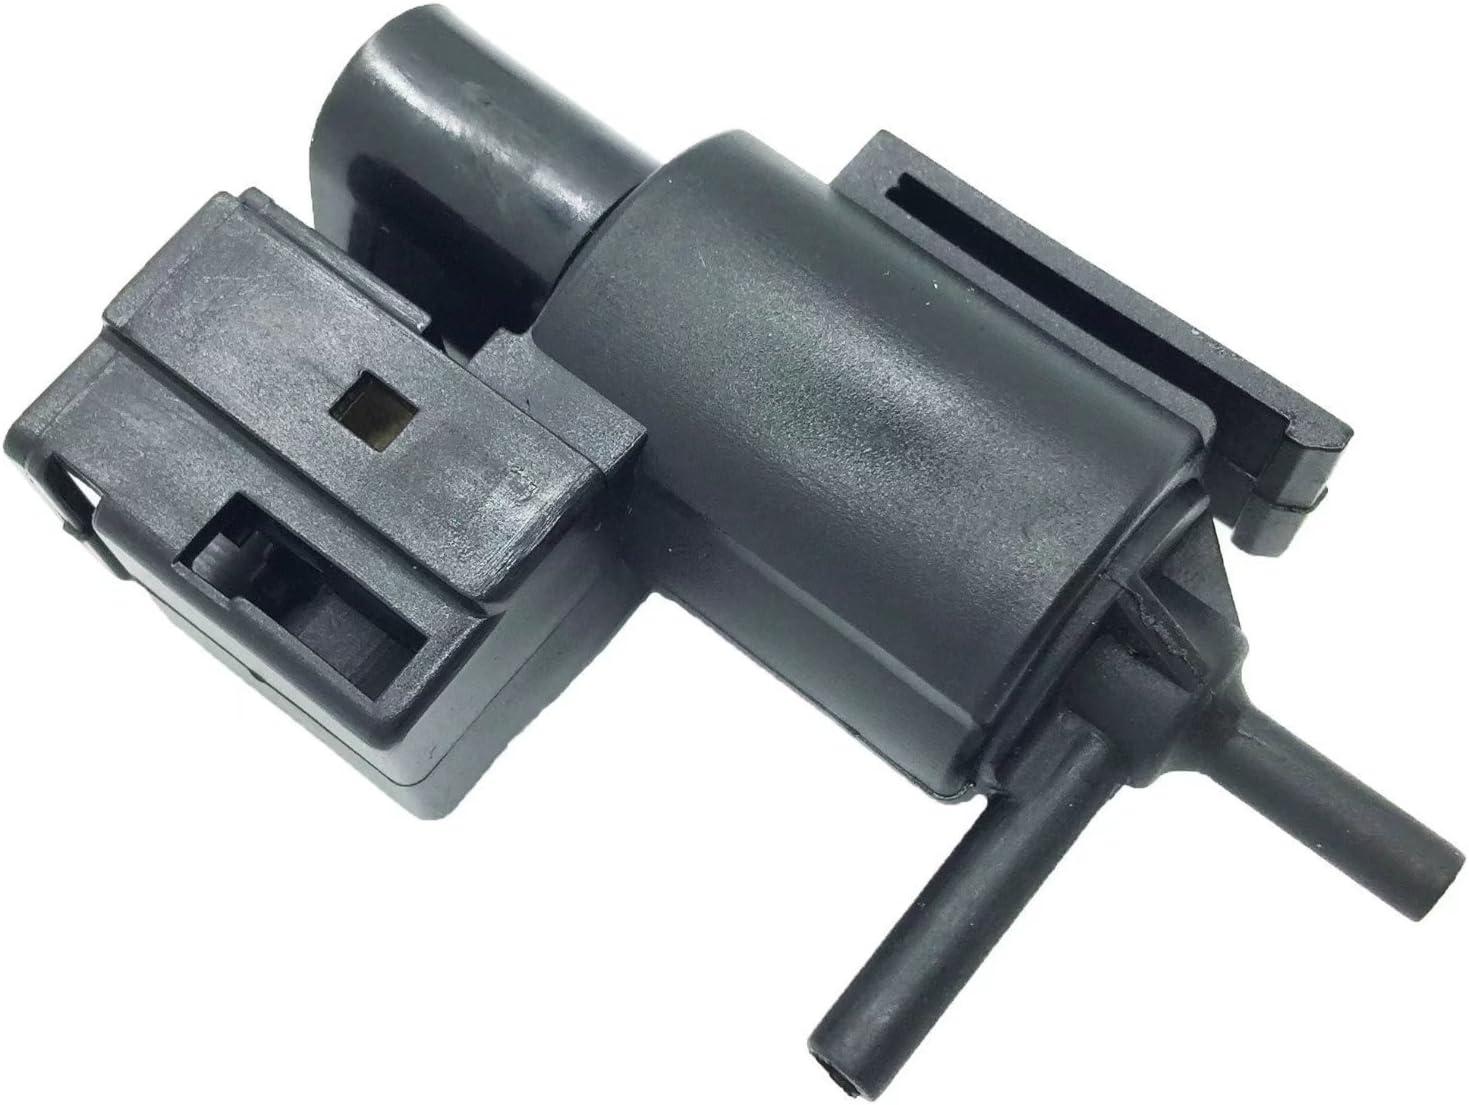 EGR VSV Indefinitely Exhaust Gas Recirculation 9 Vacuum Value Switch Max 69% OFF Solenoid